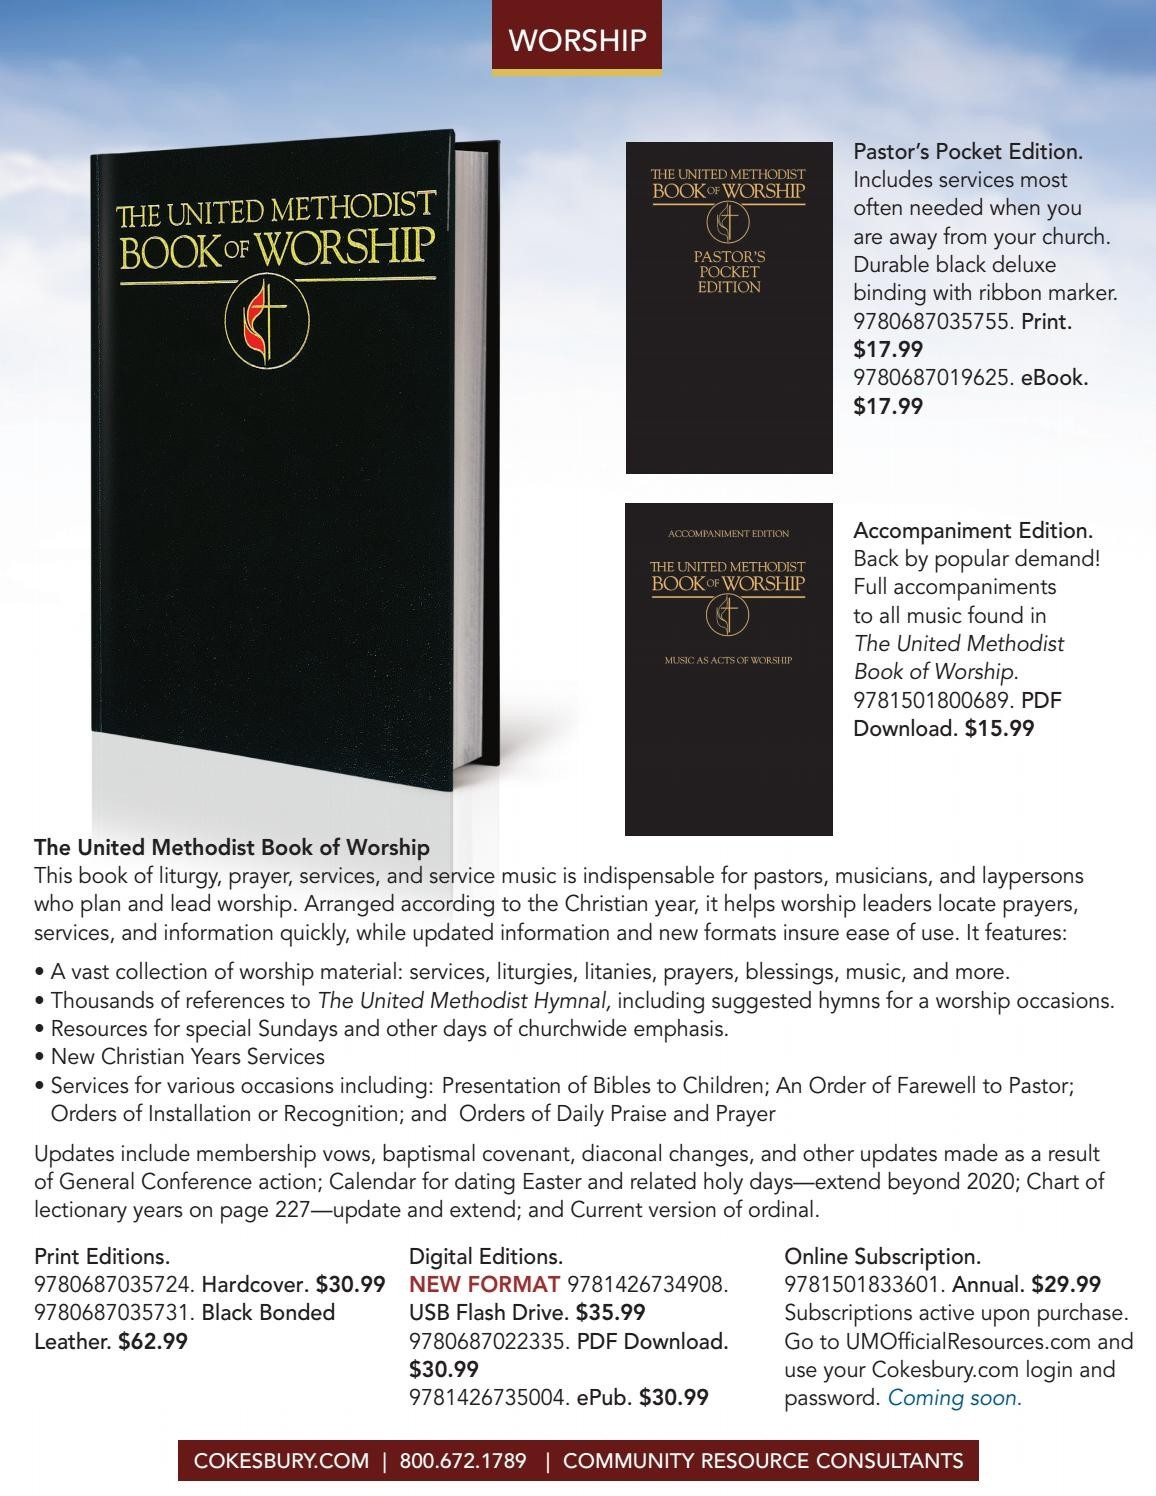 Methodist Lectionary Calendar 2020 - Template Calendar Design  2021 Church Calendar For Umc